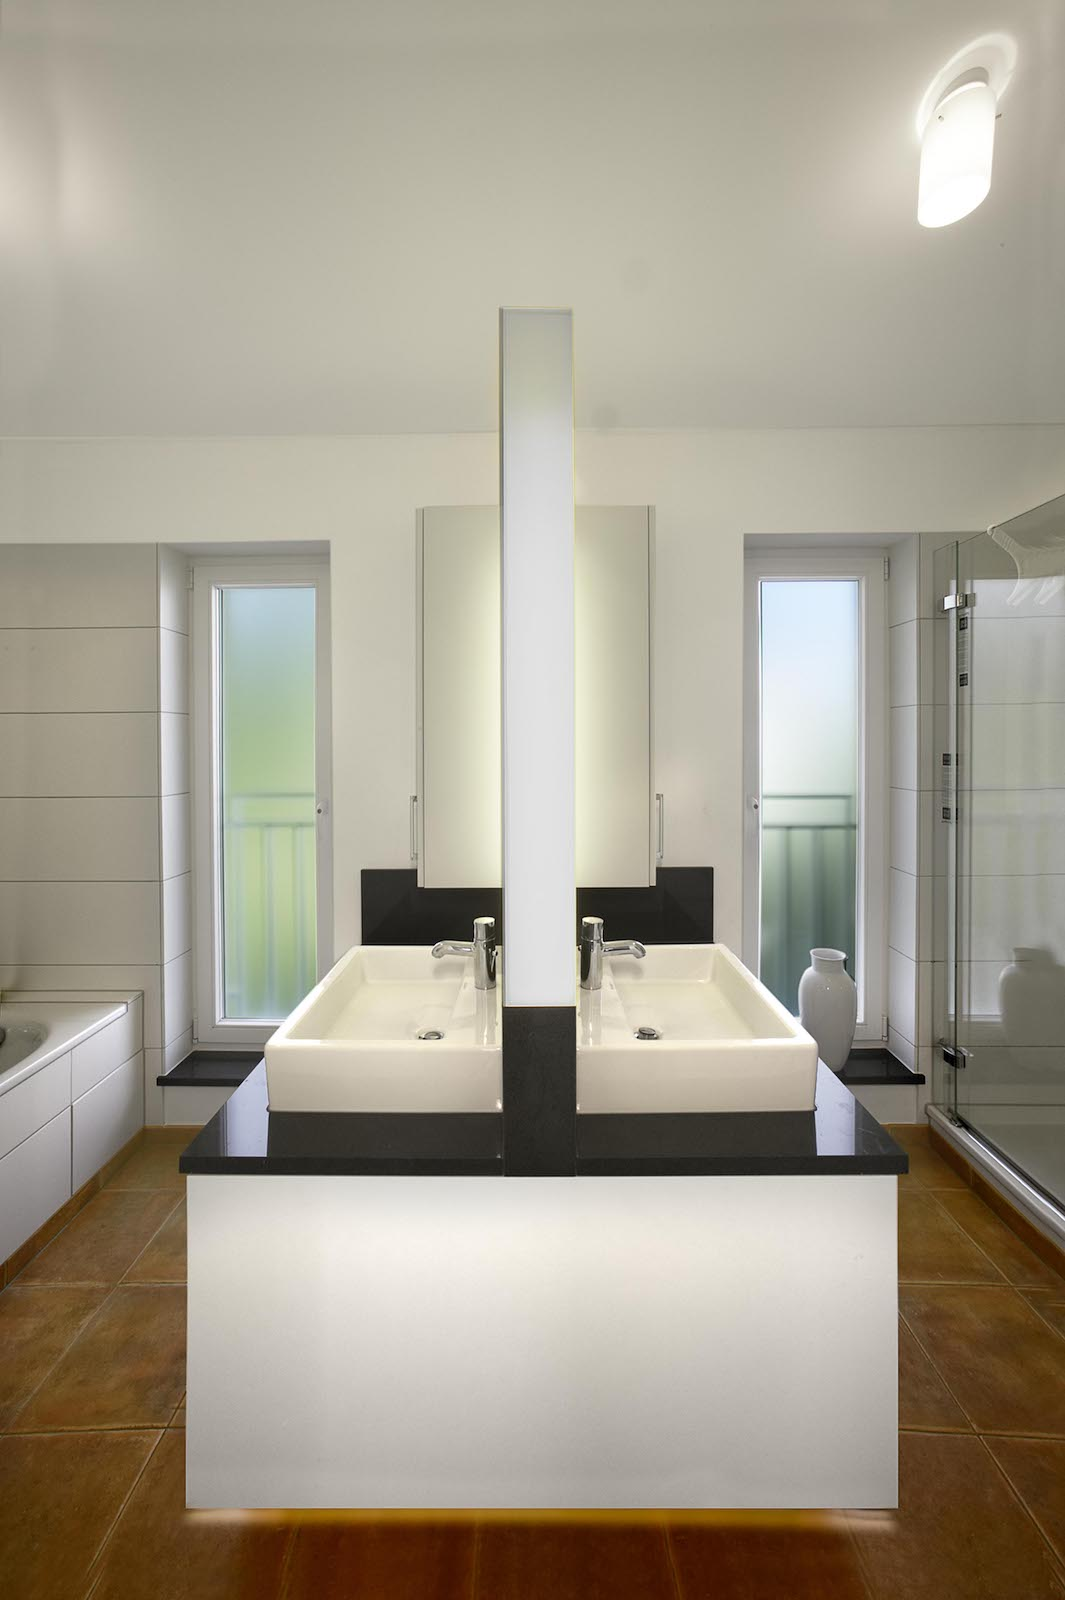 bonn 3 innenarchitekt otto pelzer. Black Bedroom Furniture Sets. Home Design Ideas